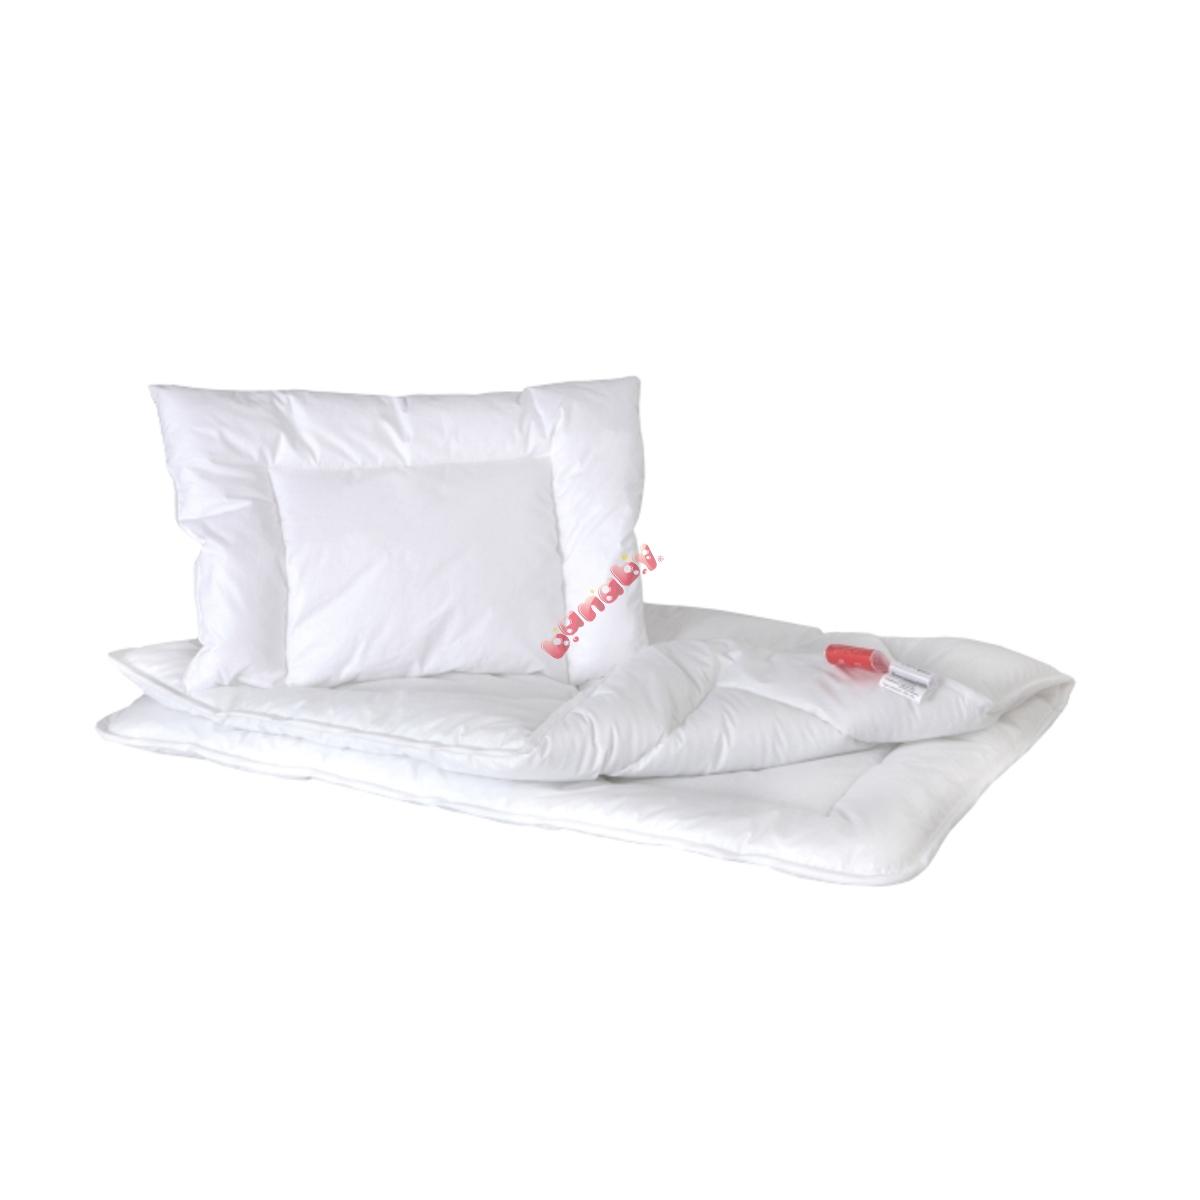 polsterung bettbezug dacron 95 c 100x135 40x60 cm. Black Bedroom Furniture Sets. Home Design Ideas